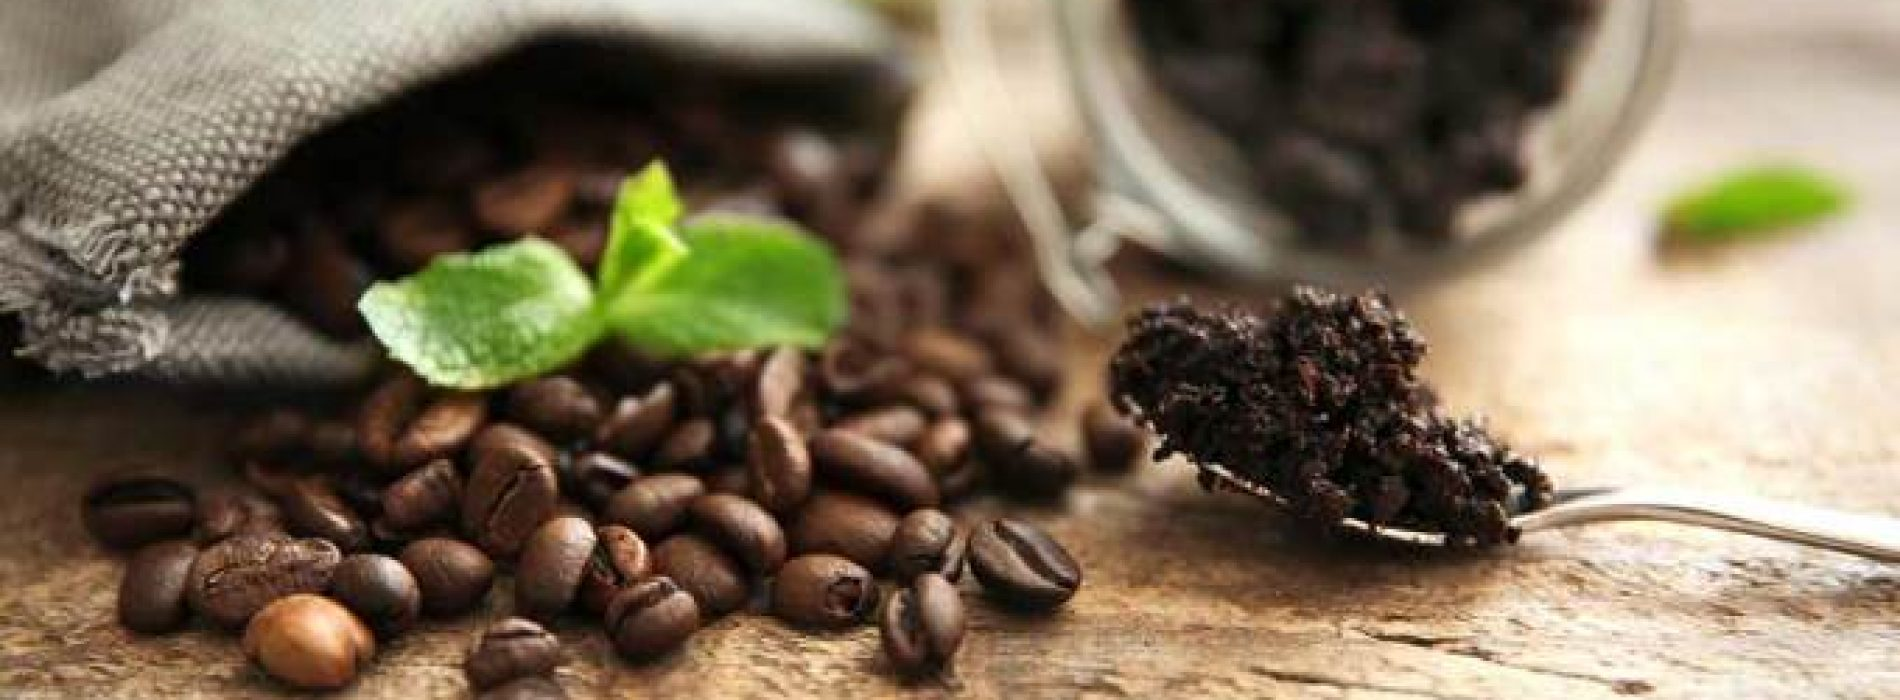 What Makes Coffee Organic